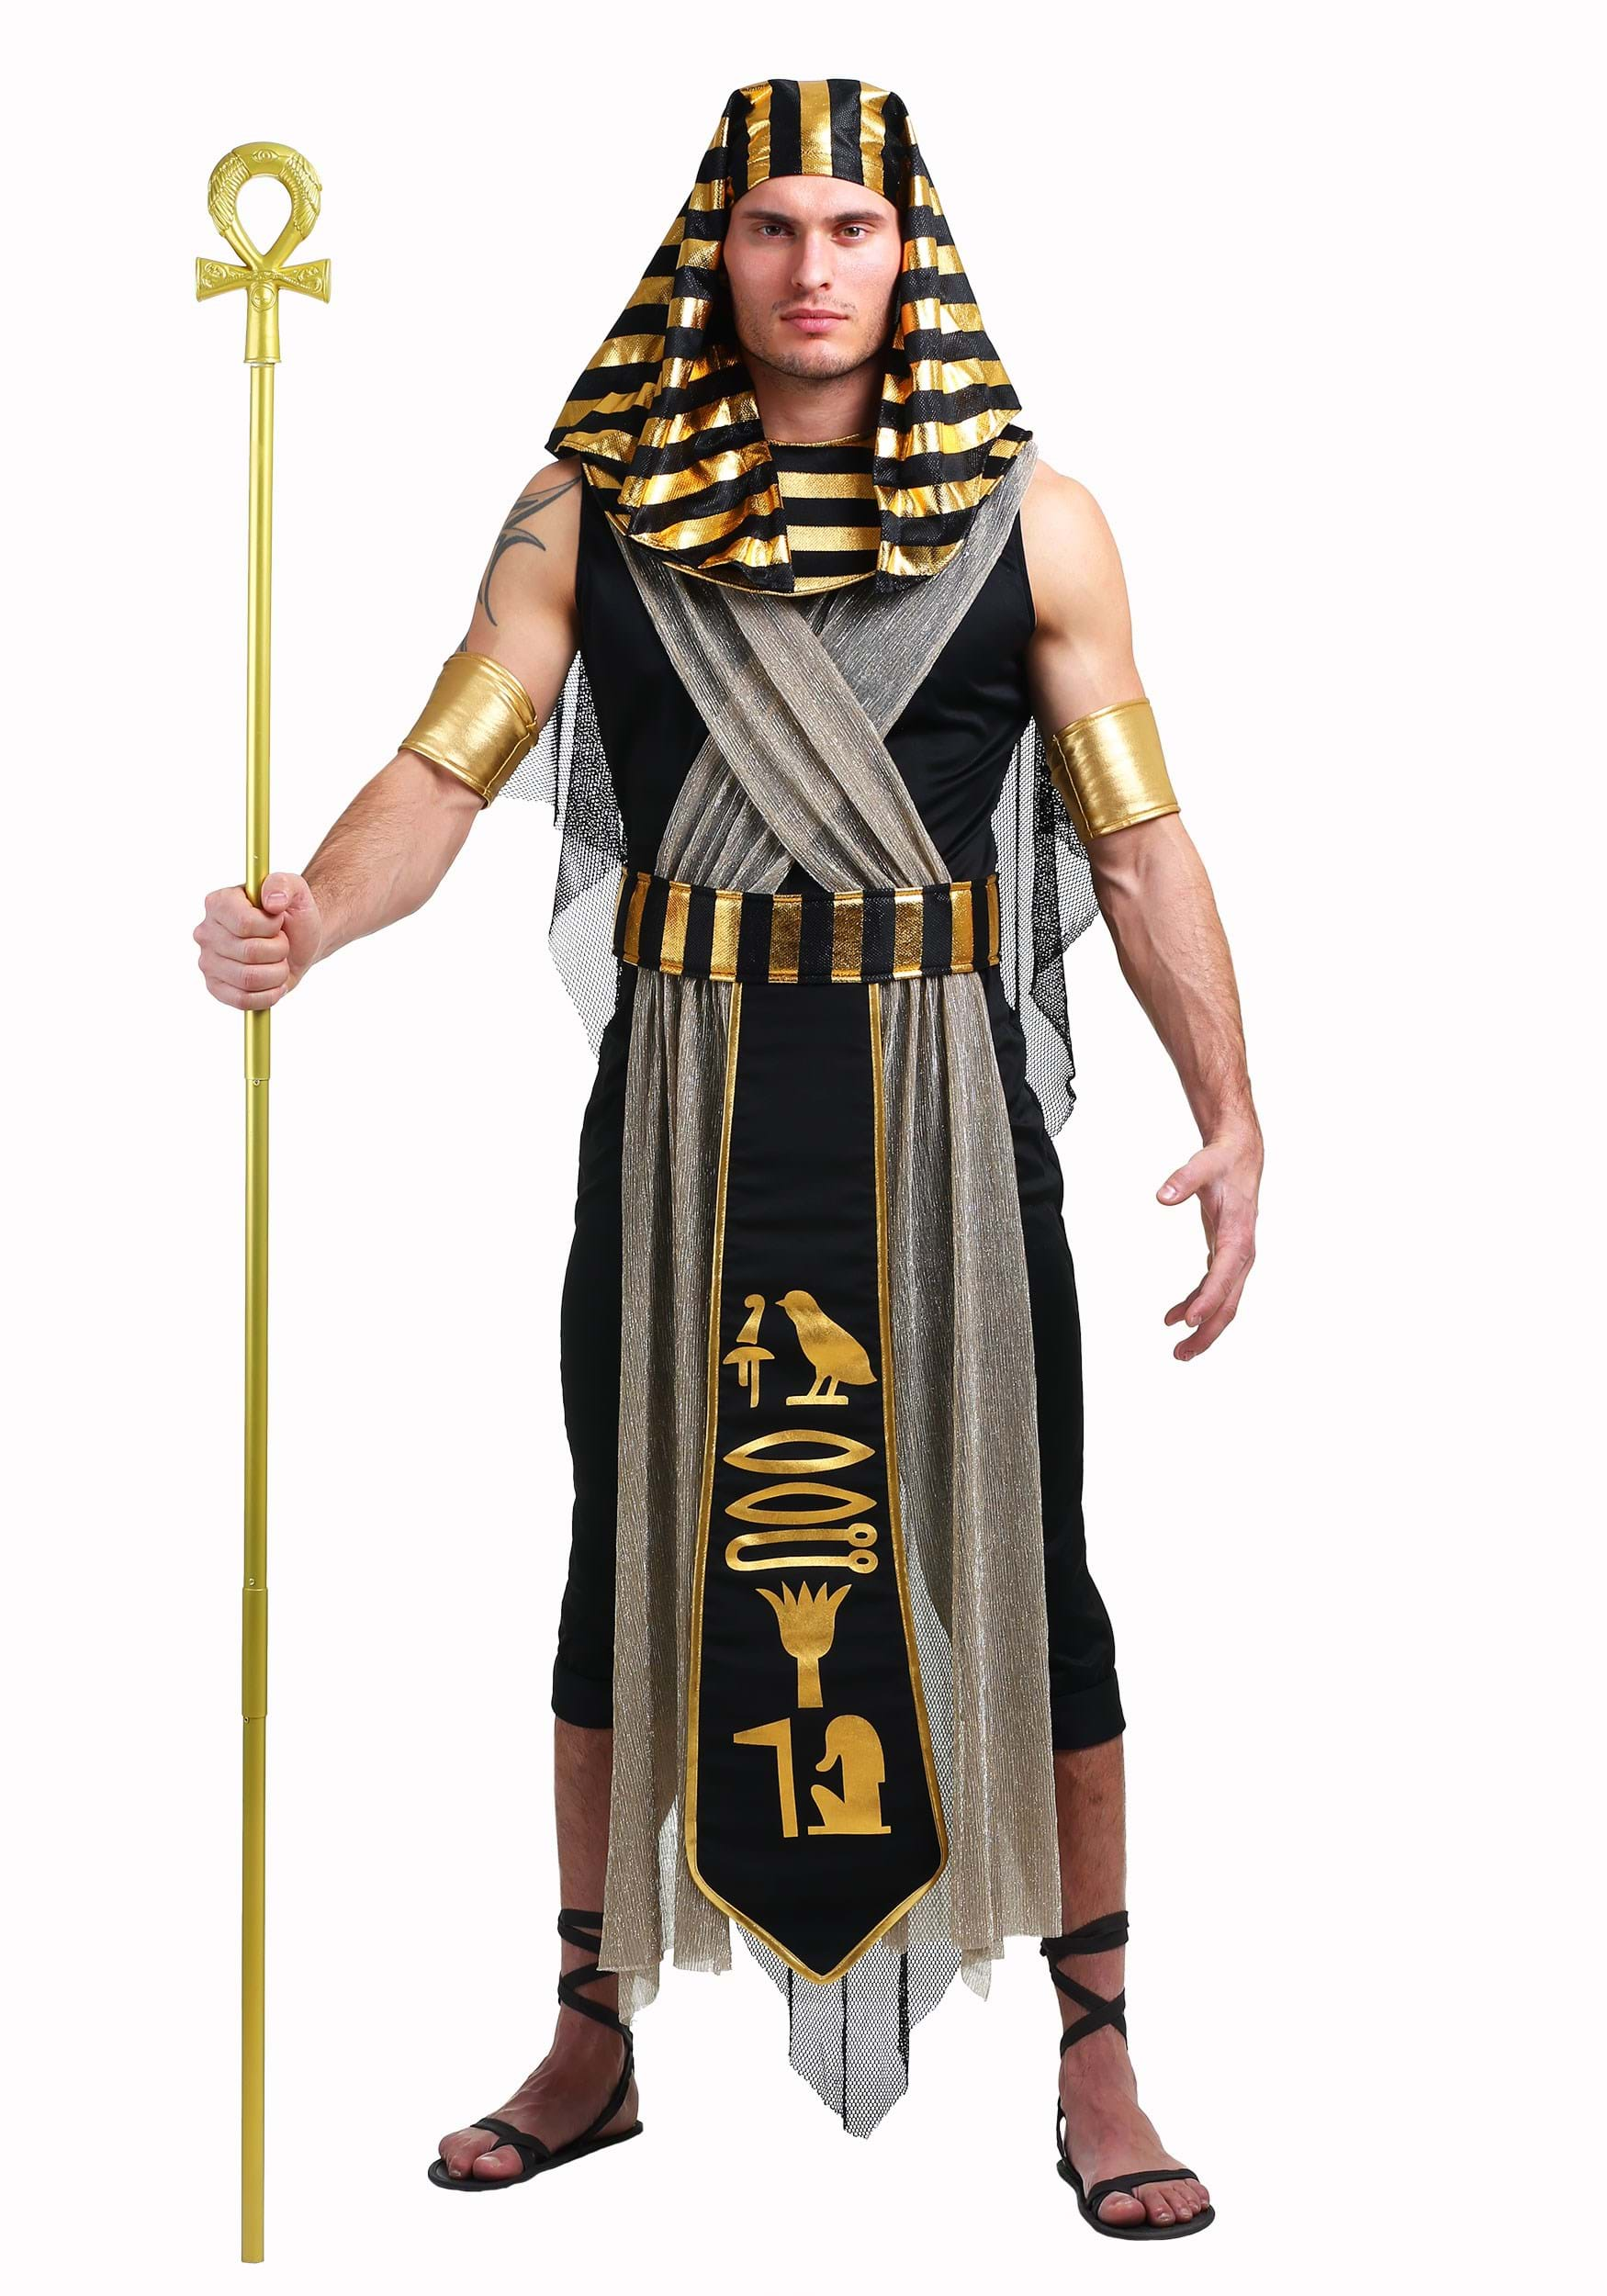 487147aa7f5 All Powerful Pharaoh Costume for Men